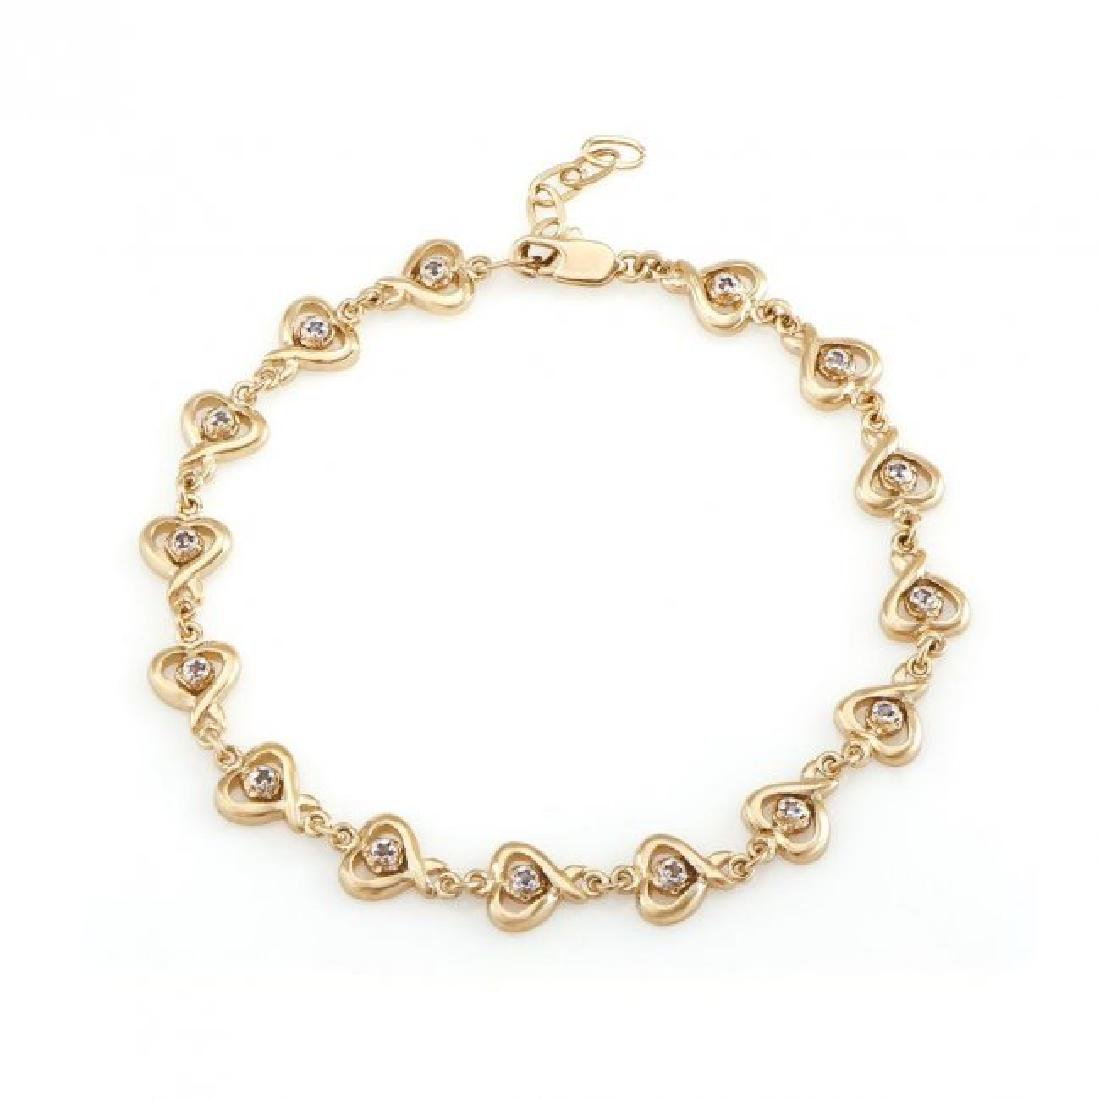 0.69 CT Diamond Designer Hearts Bracelet $1,375.00!